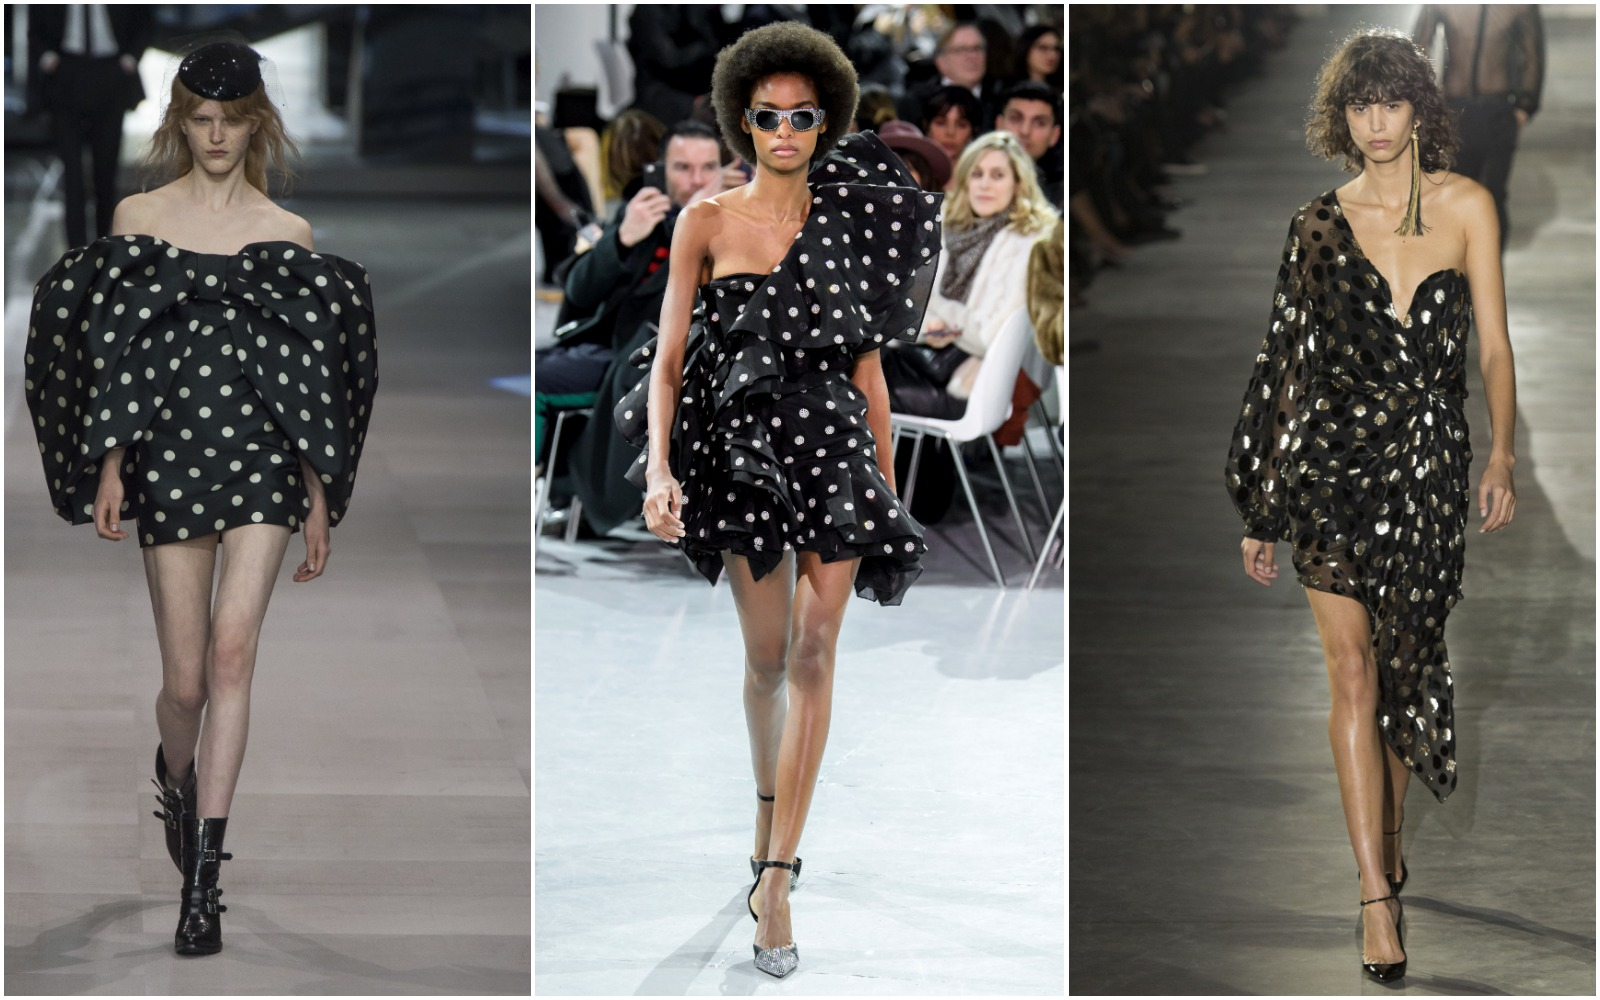 Uuups! Când similitudinea este prea mult? Celine, Alexandre Vaulthier și Saint Laurent!